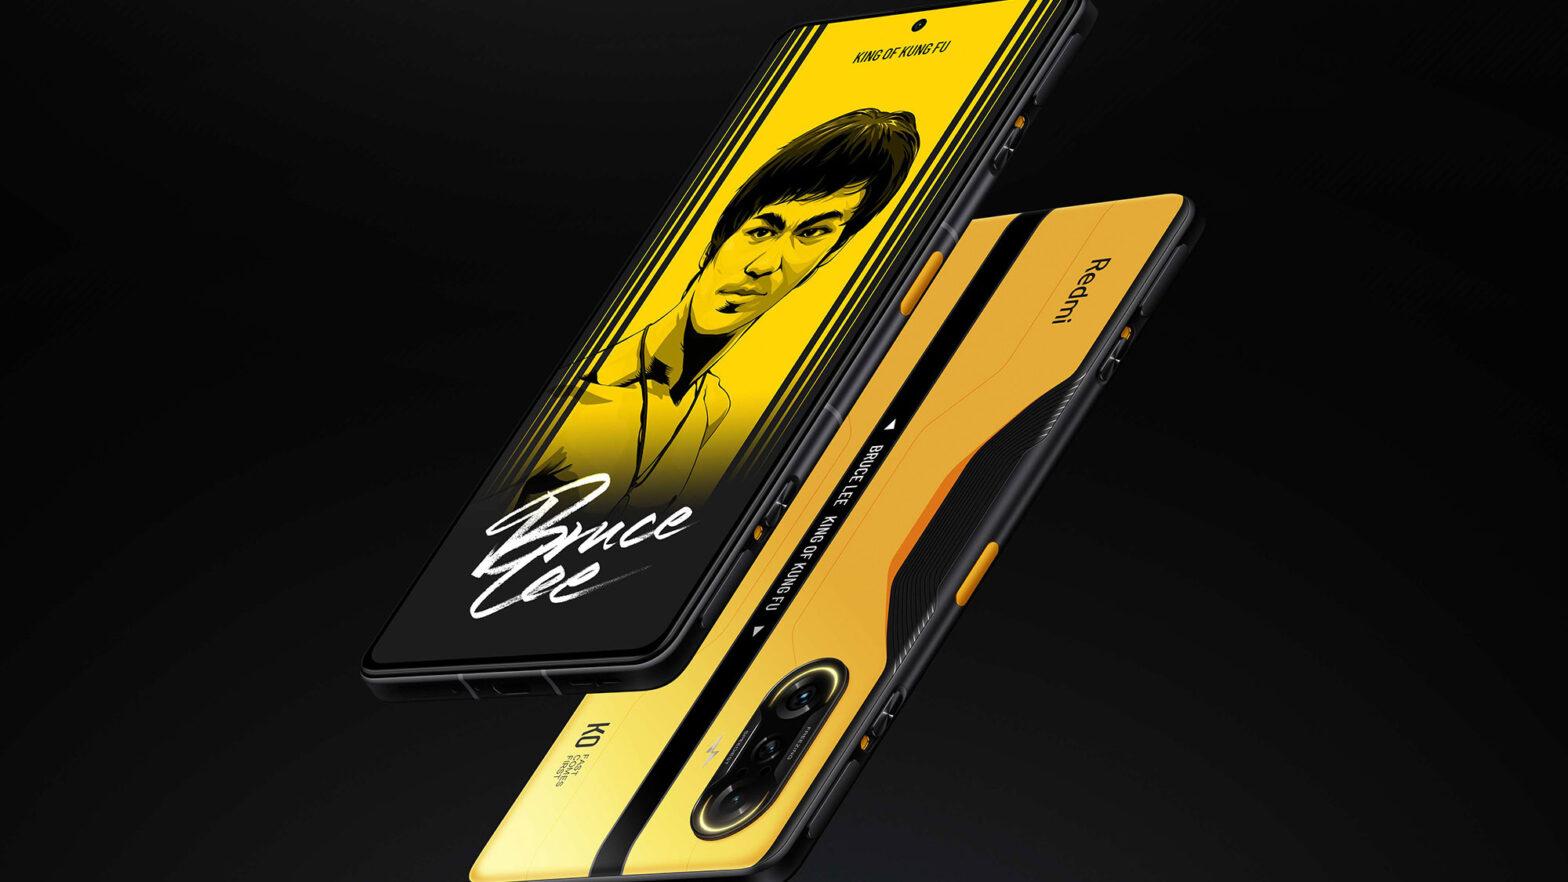 Redmi K40 Bruce Lee Edition Smartphone